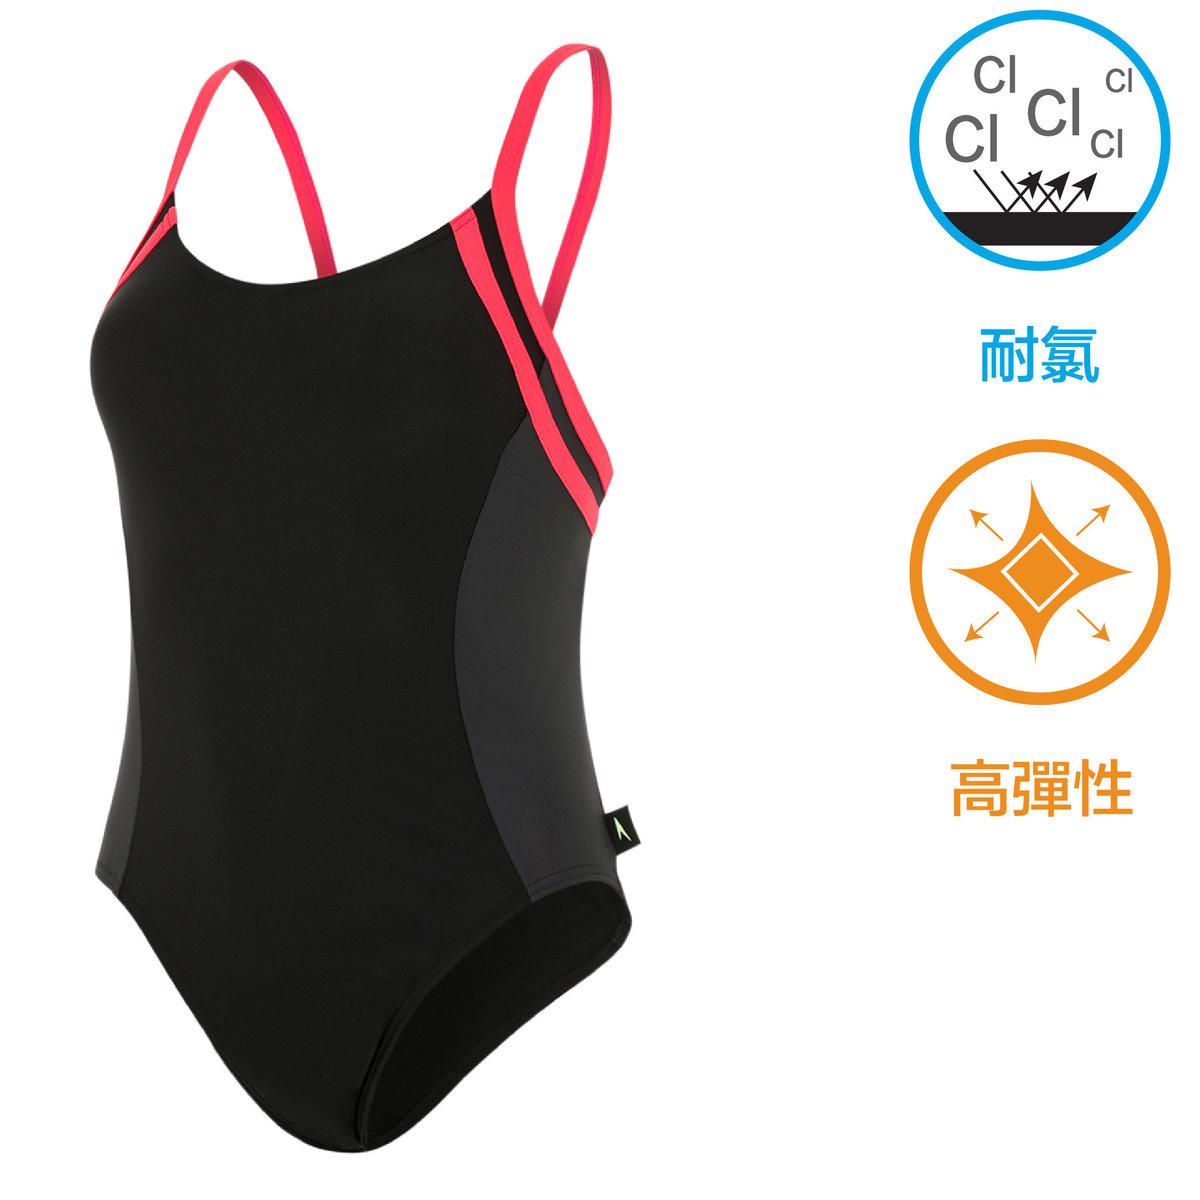 Speedo - ENDURANCE10 HYDRACTIVE 女士連身泳衣